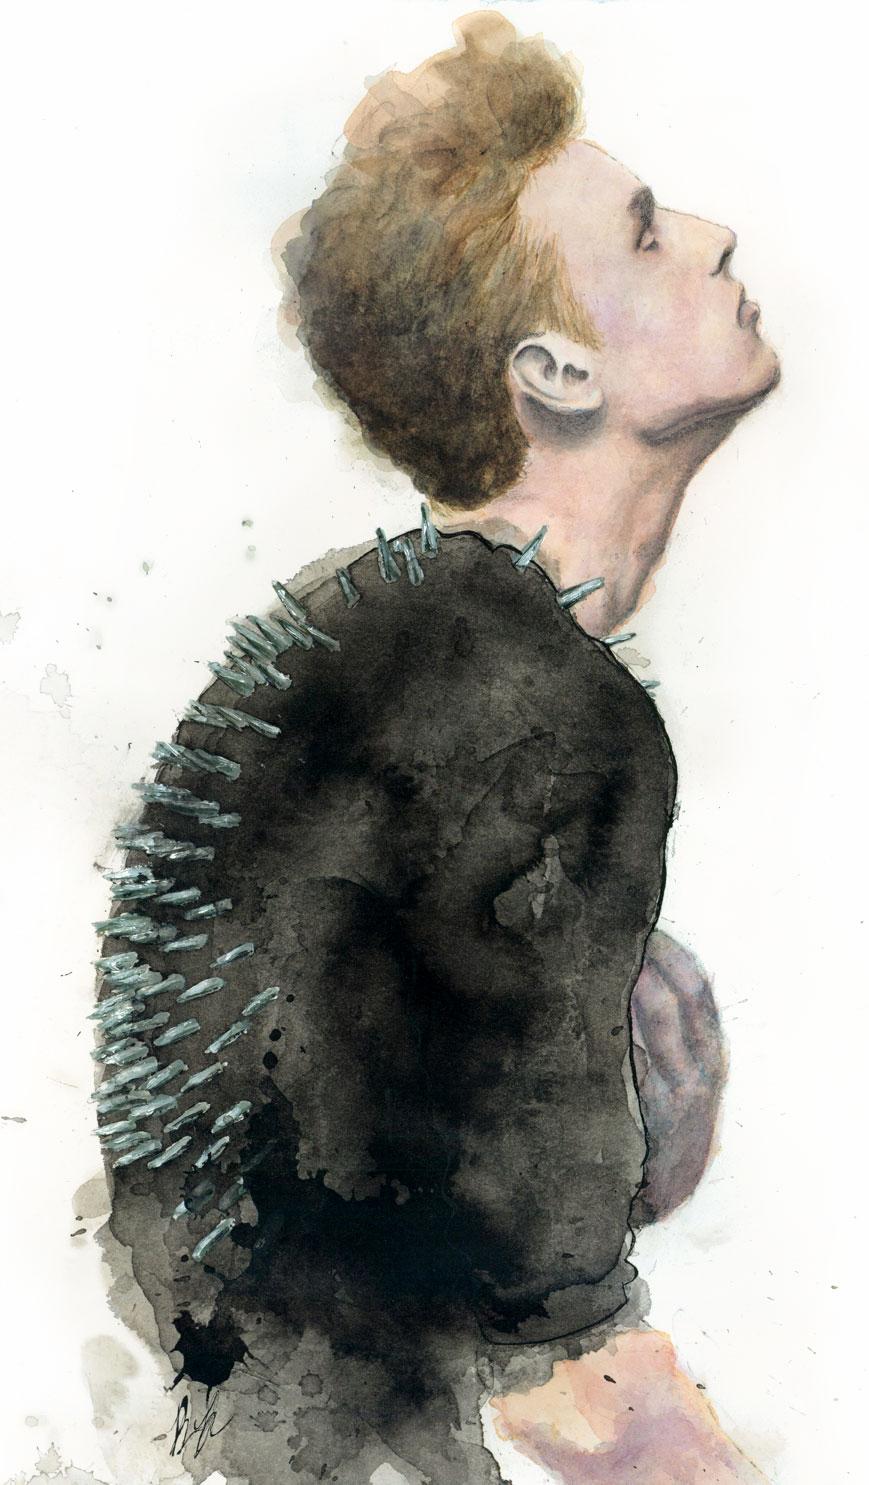 Oskar-Landstrom-Justin-Wu-Shan-Temuri-Benjamin-Edward-Illustration.jpg